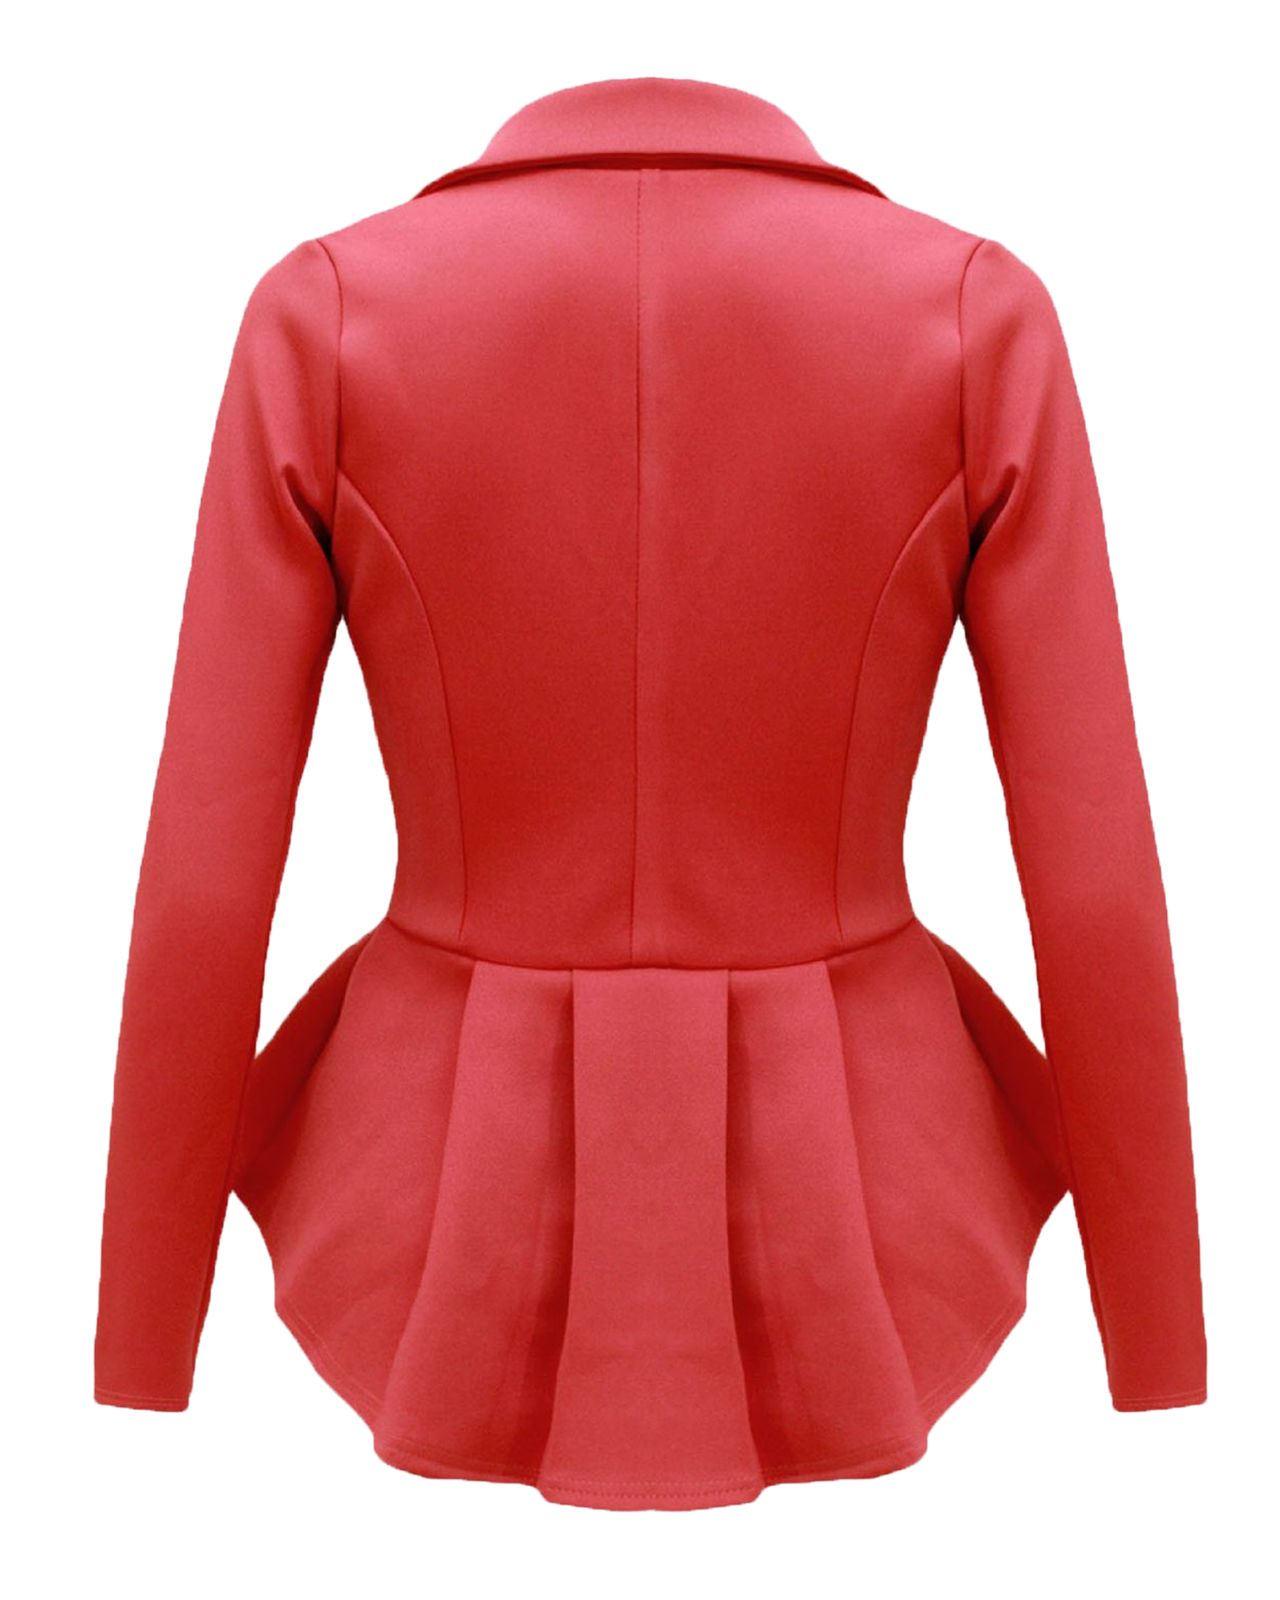 New Ladies Women Crop Frill Shift Slim Fit Office Jackt Peplum Blazer Coat 8-16